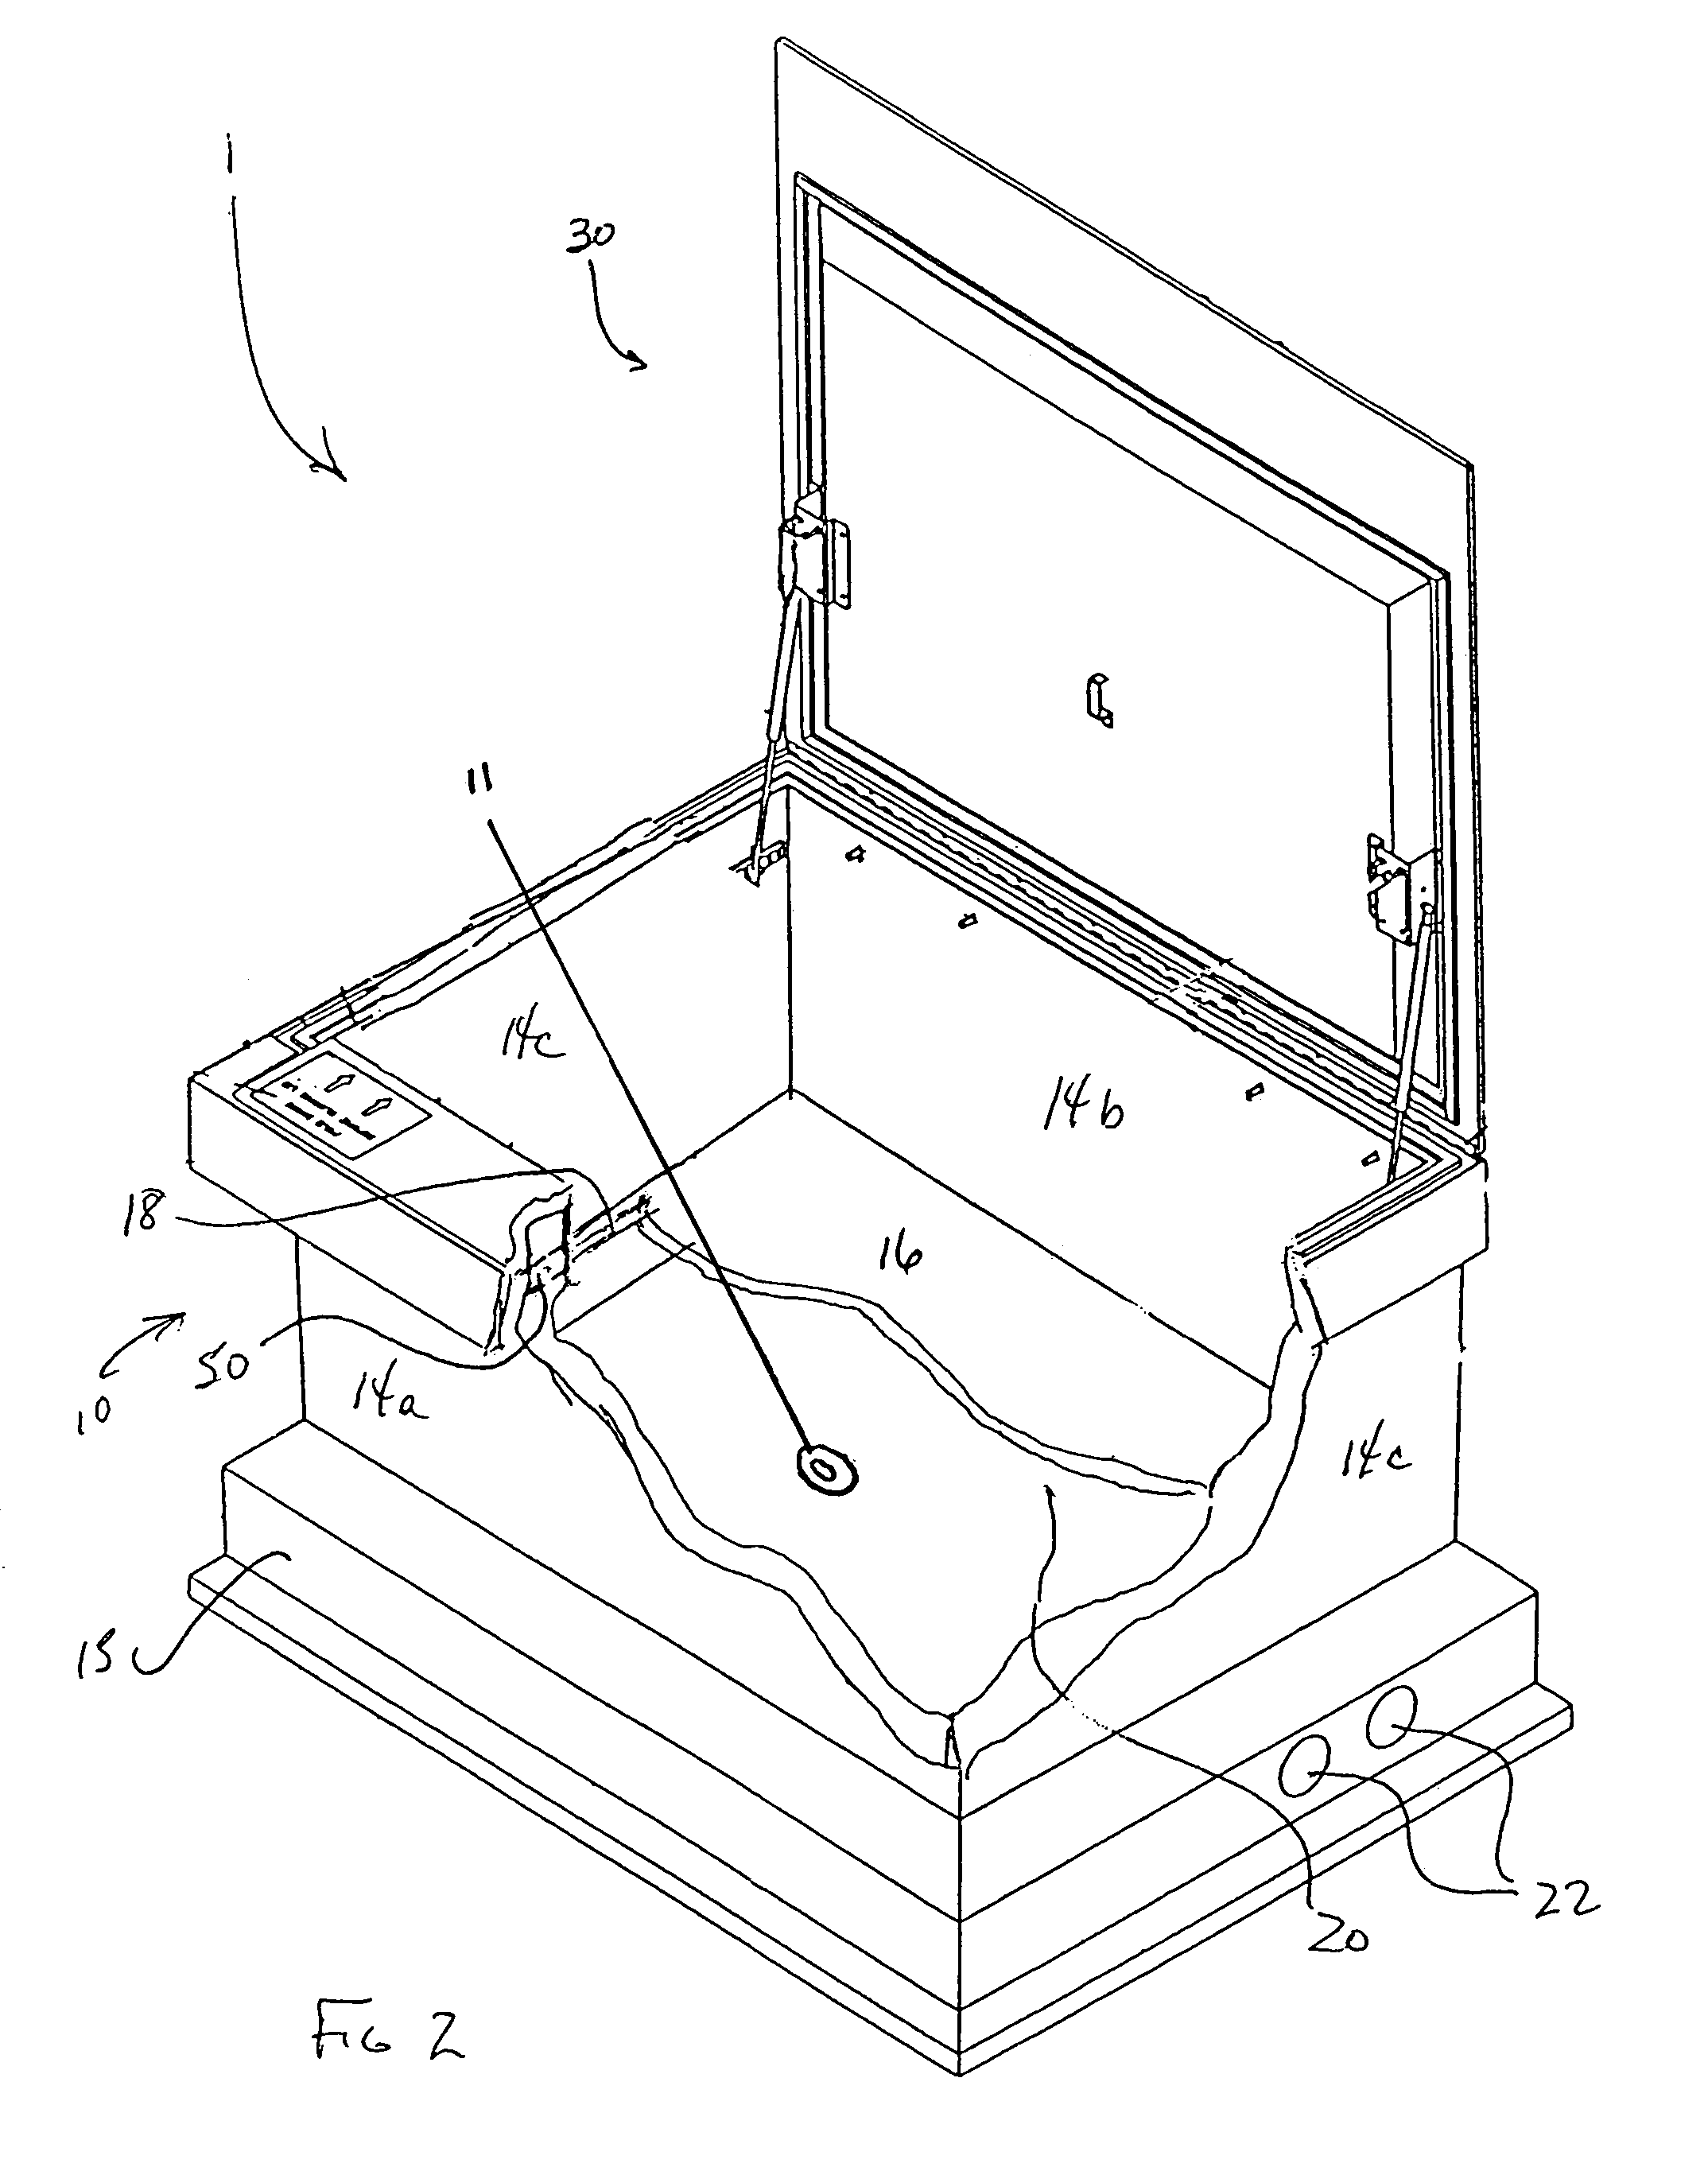 patent us7475515 - flush to grade utilities vault